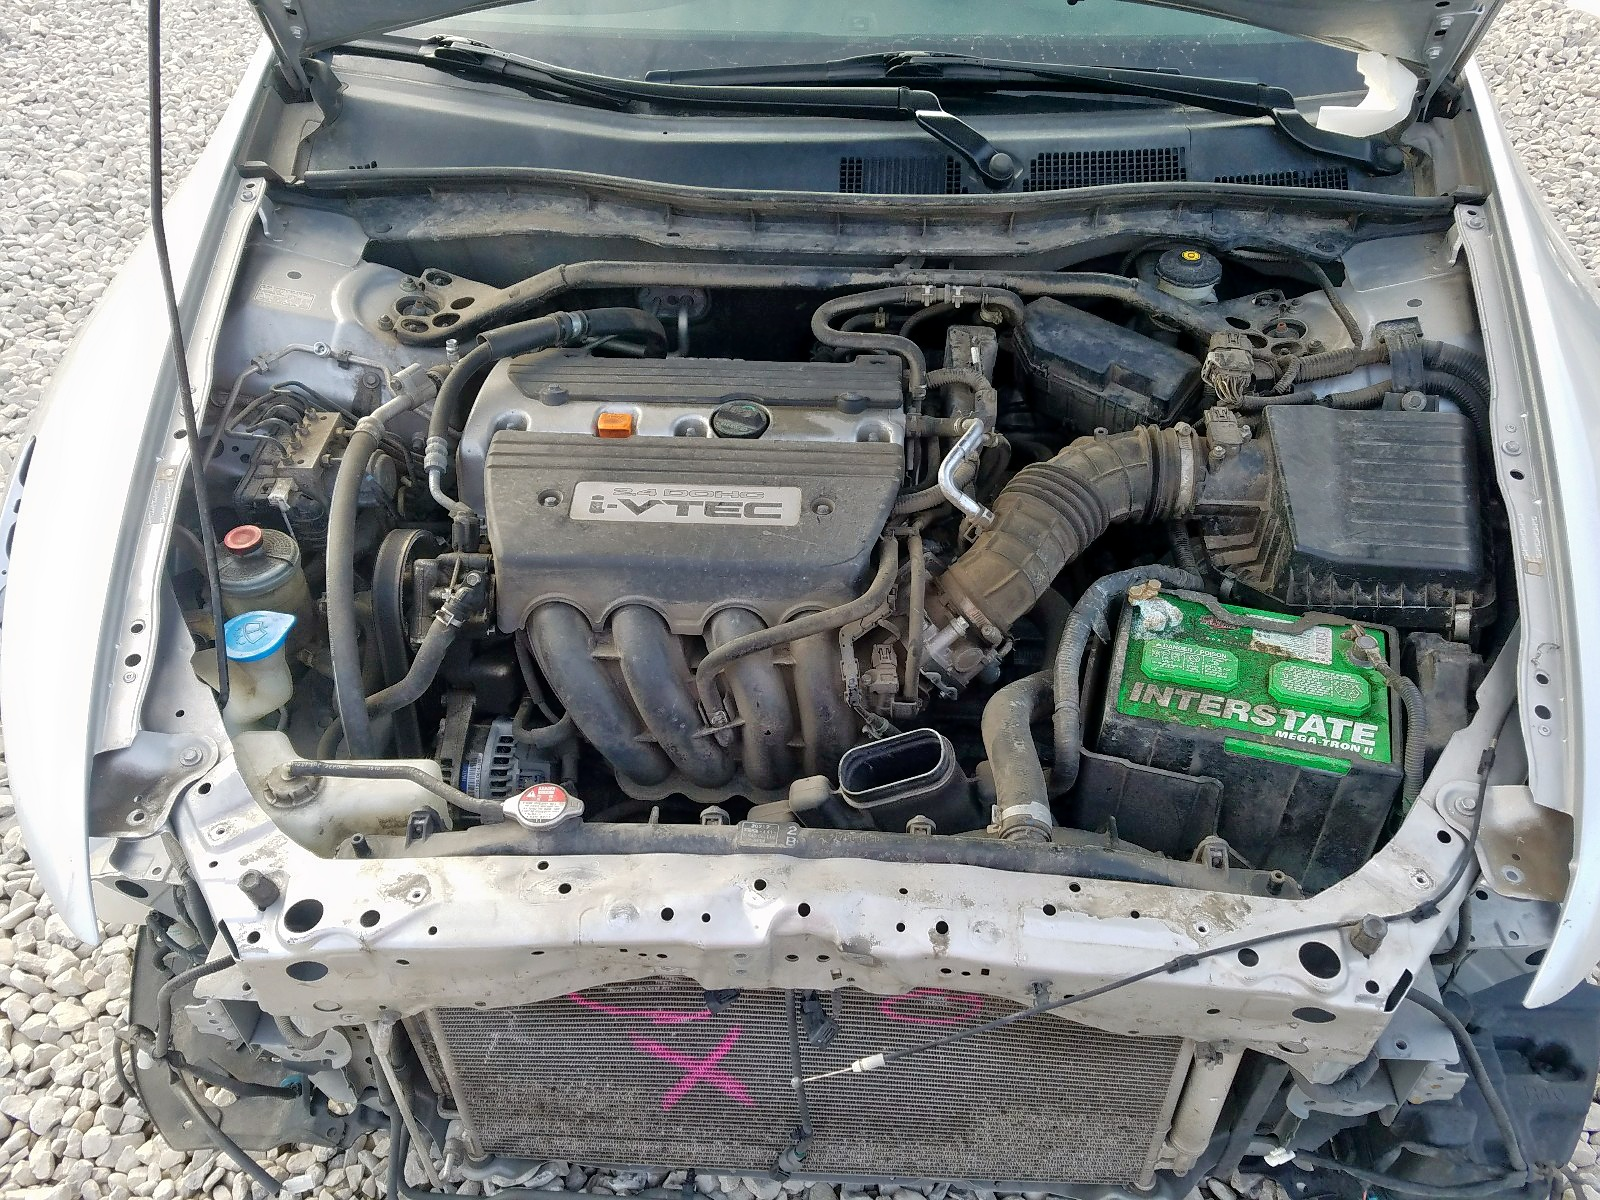 JHMCP26898C039017 - 2008 Honda Accord Exl 2.4L inside view